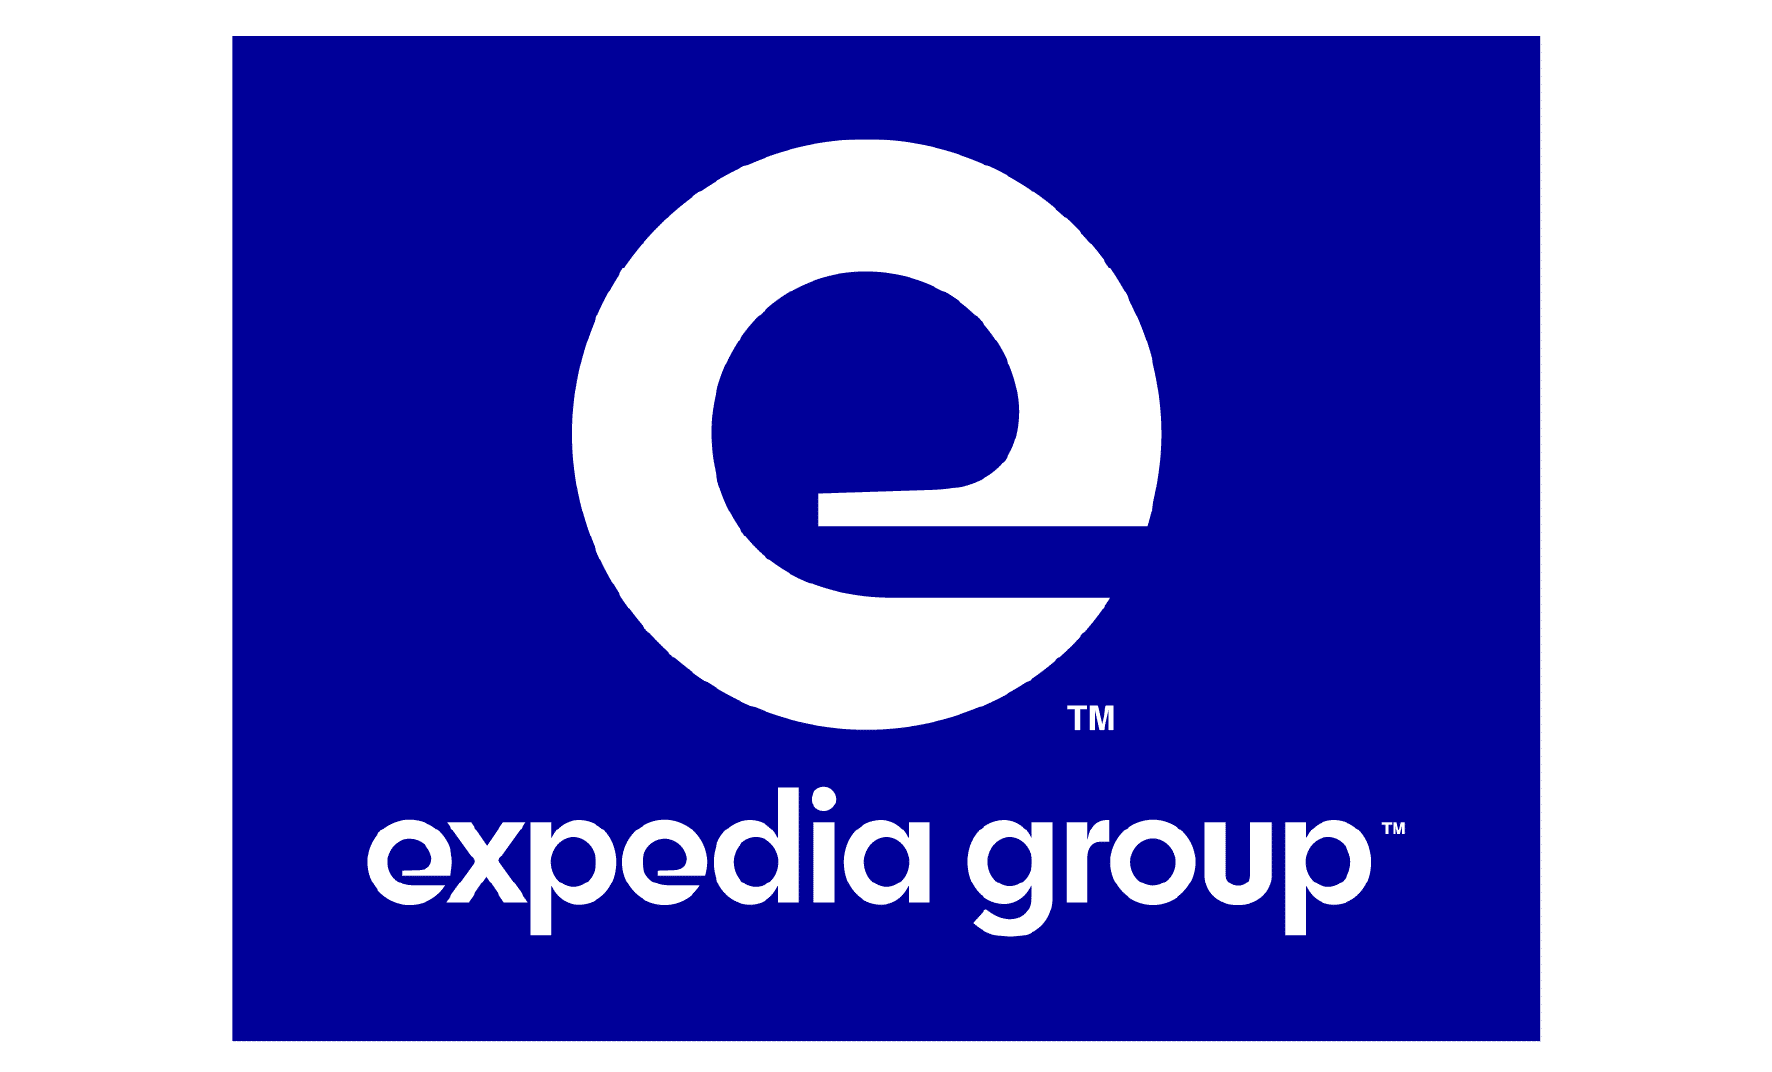 Expedia copy